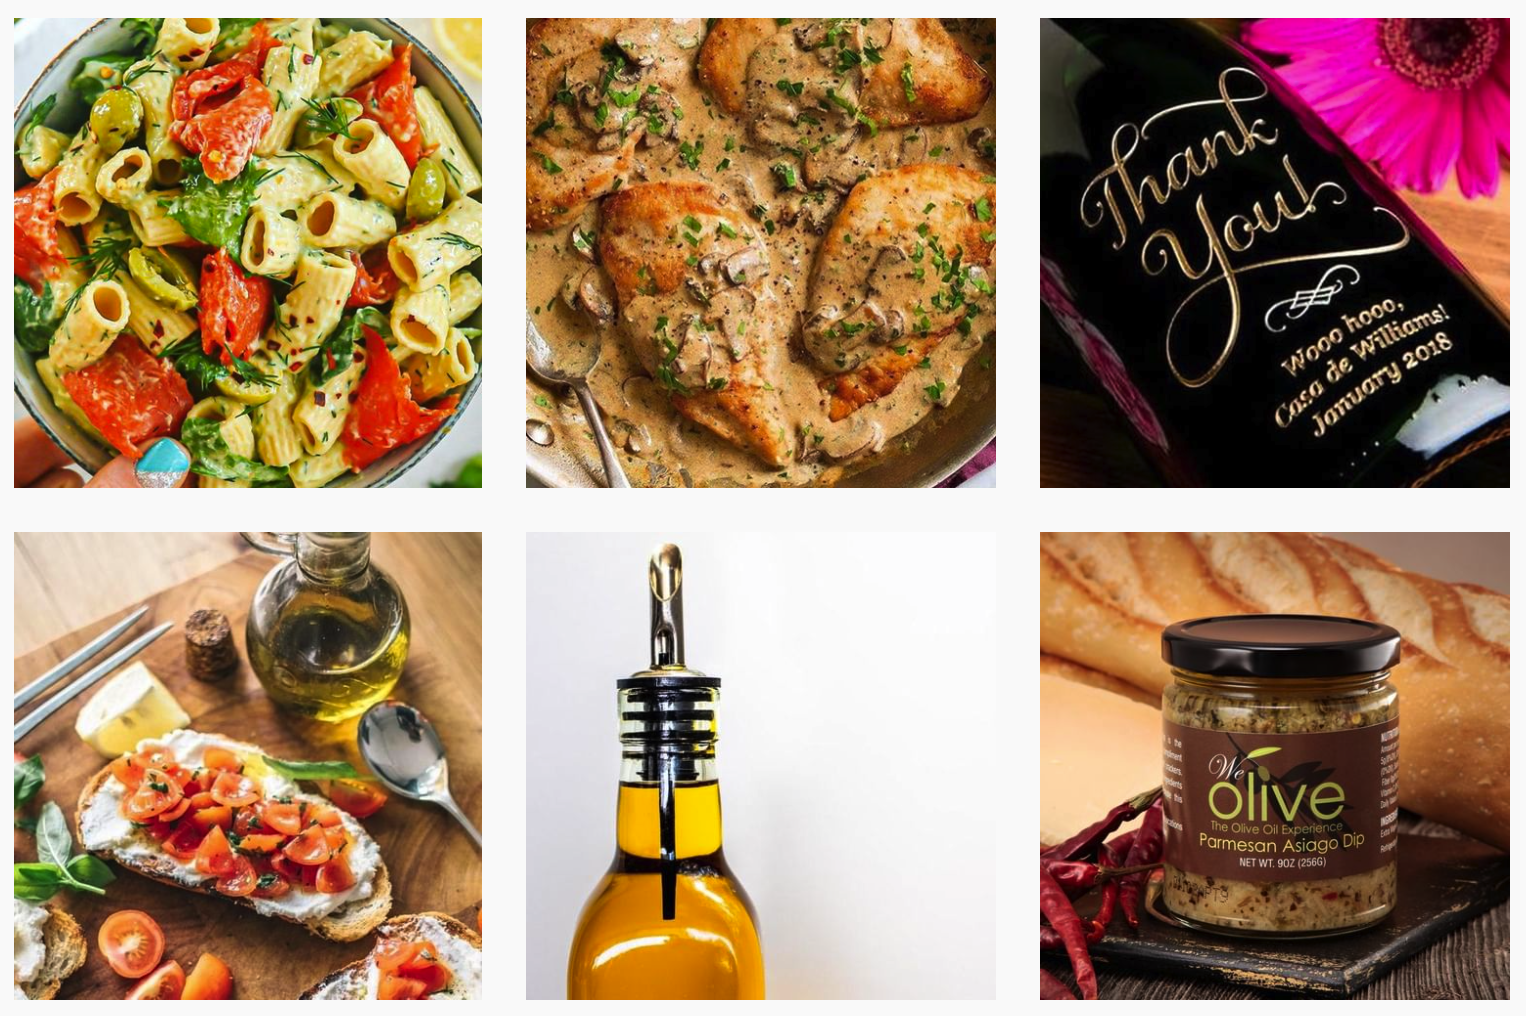 We Olive | Food Brands with Influencer Programs